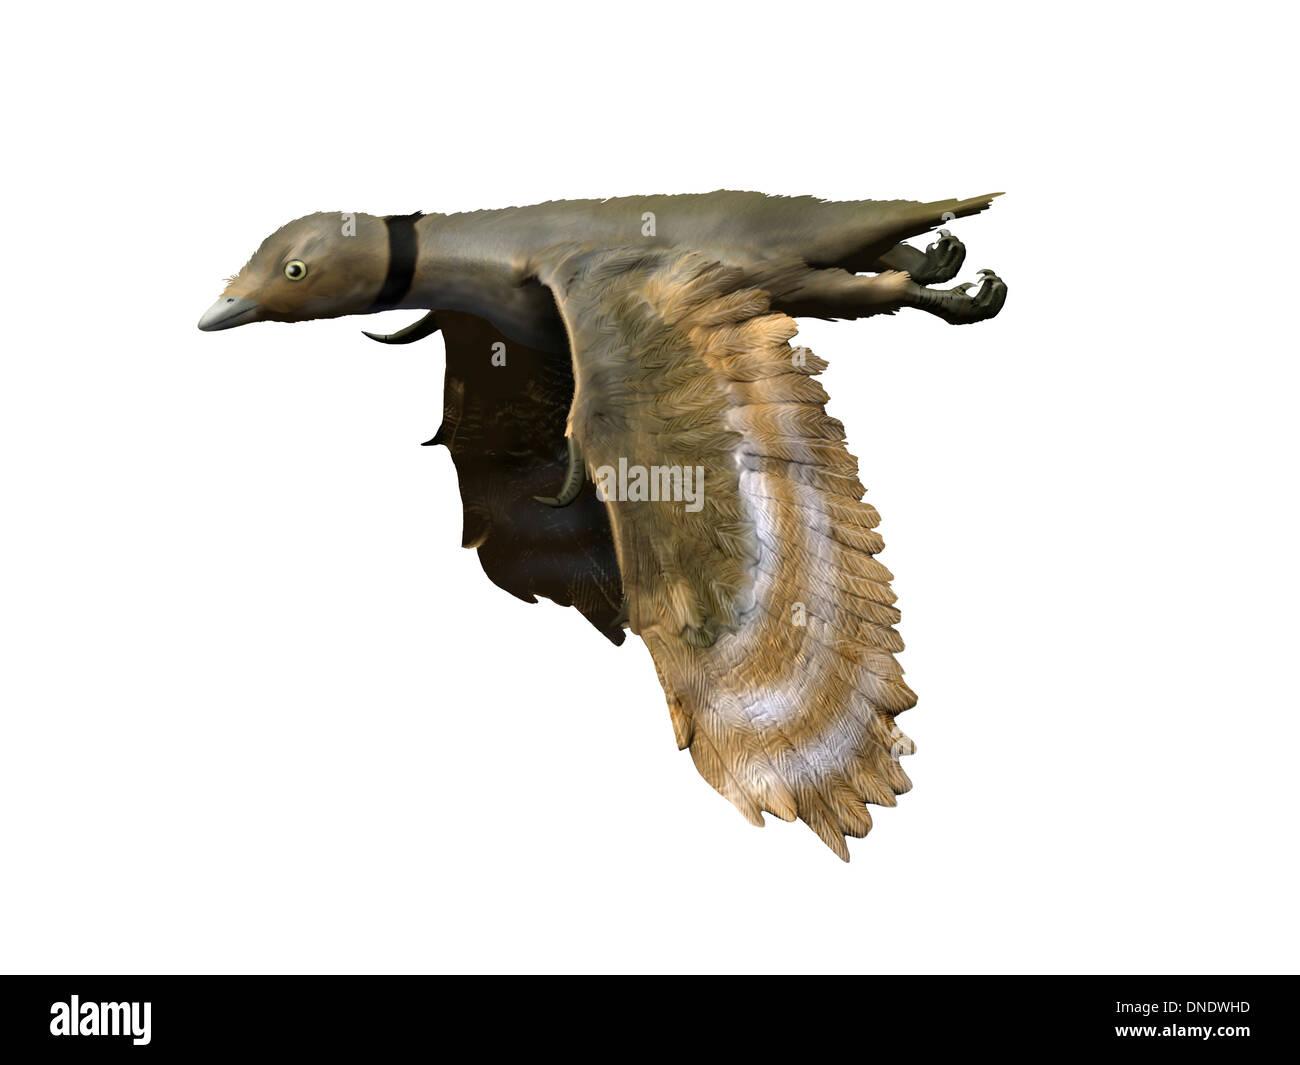 Iberomesornis romerali, Early Cretaceous of Spain. - Stock Image